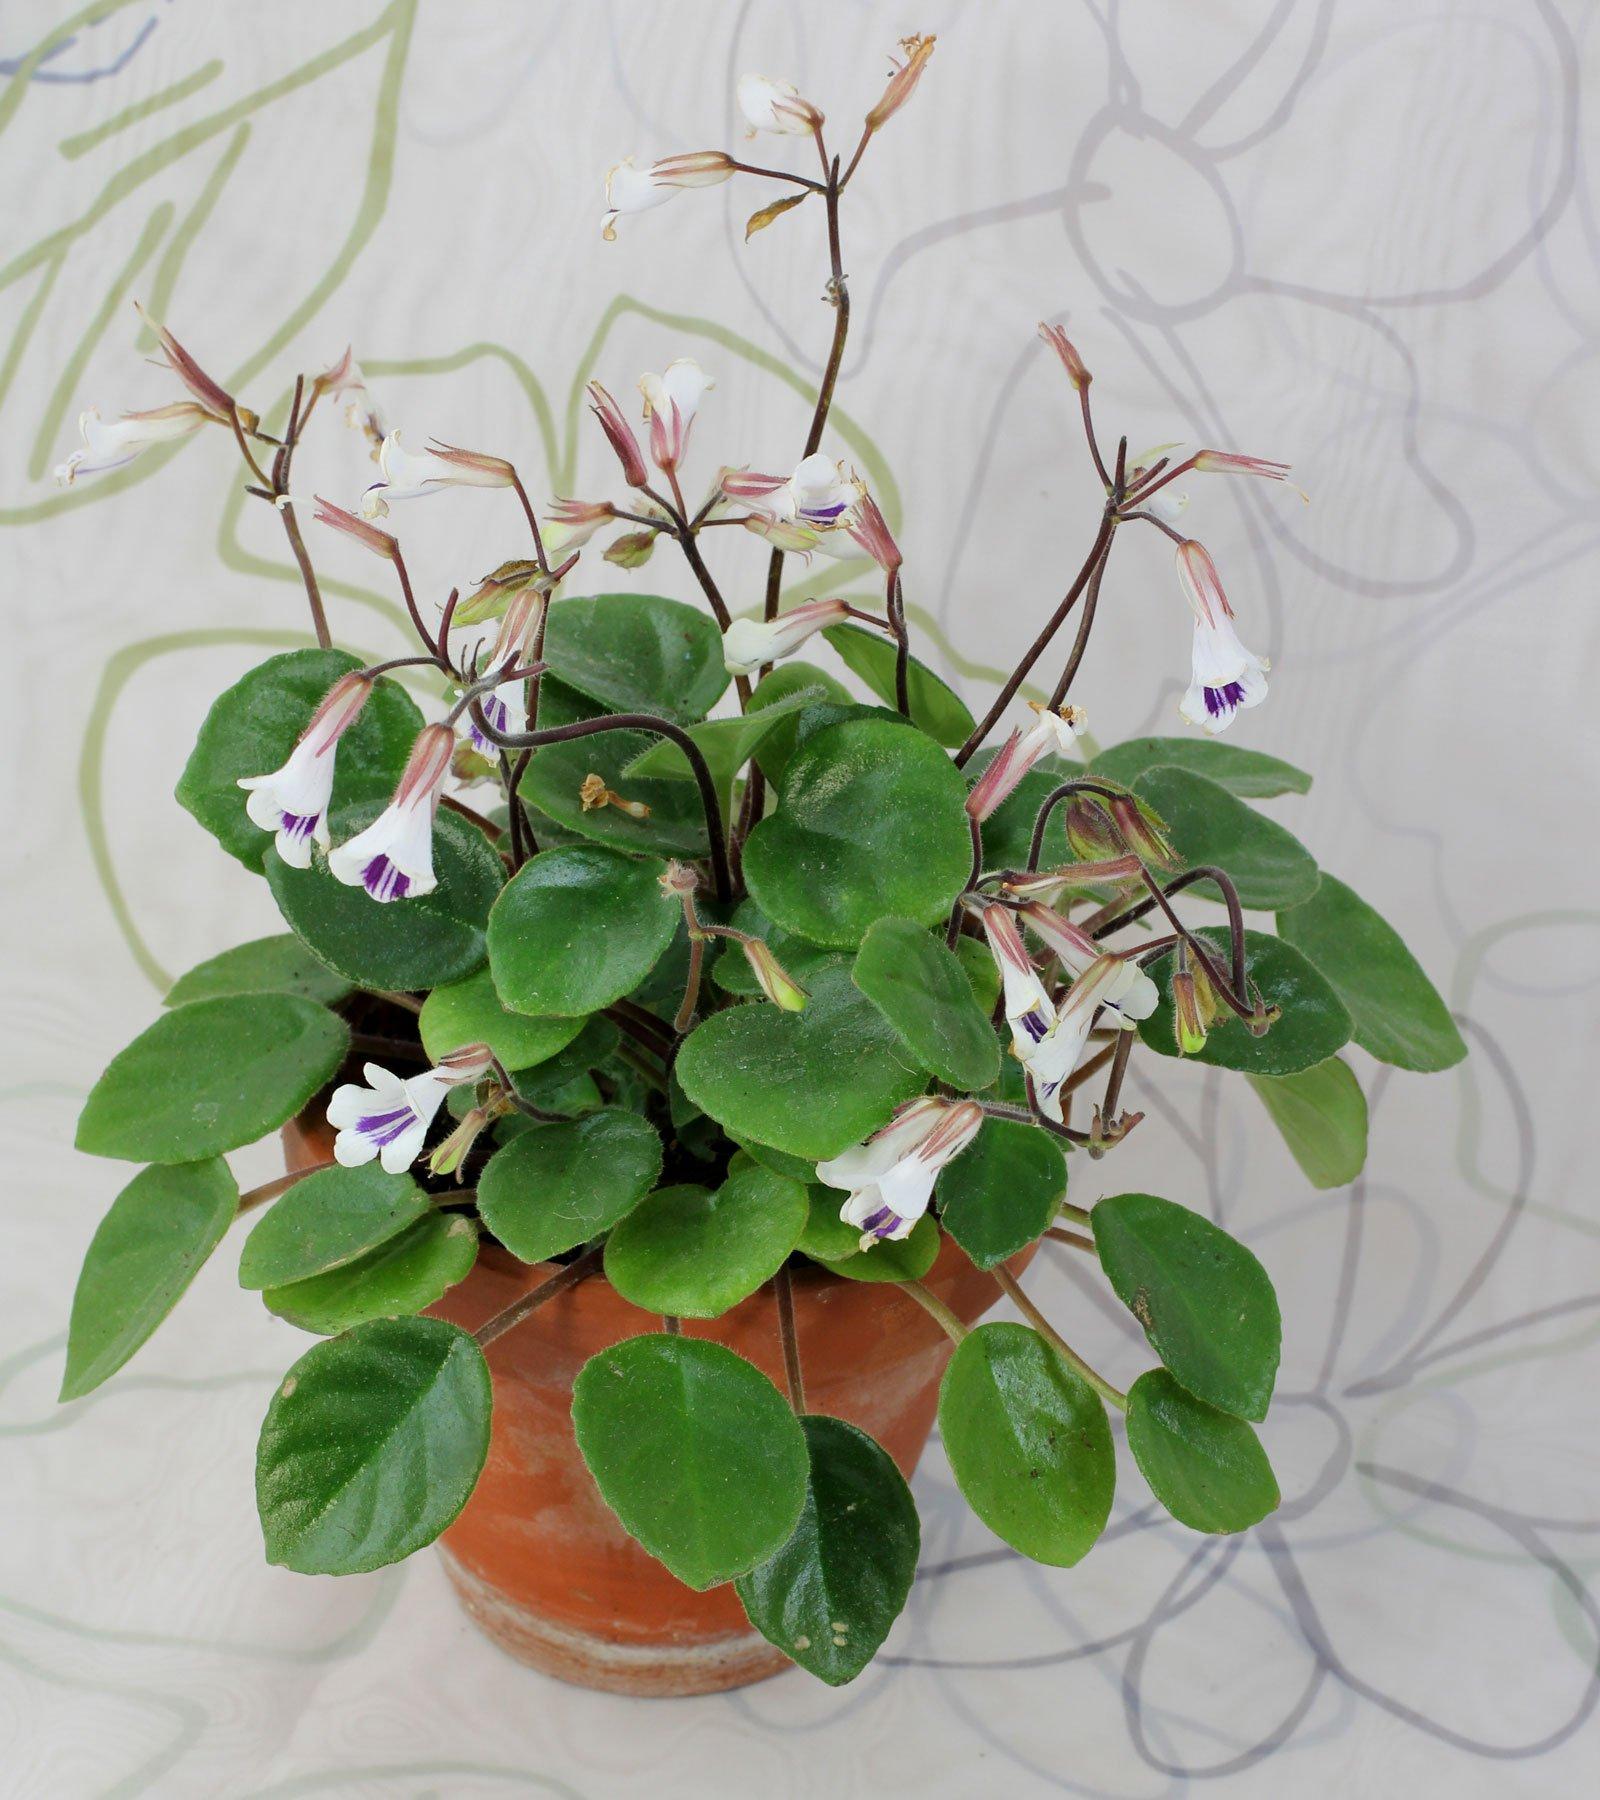 Primulina tamiana